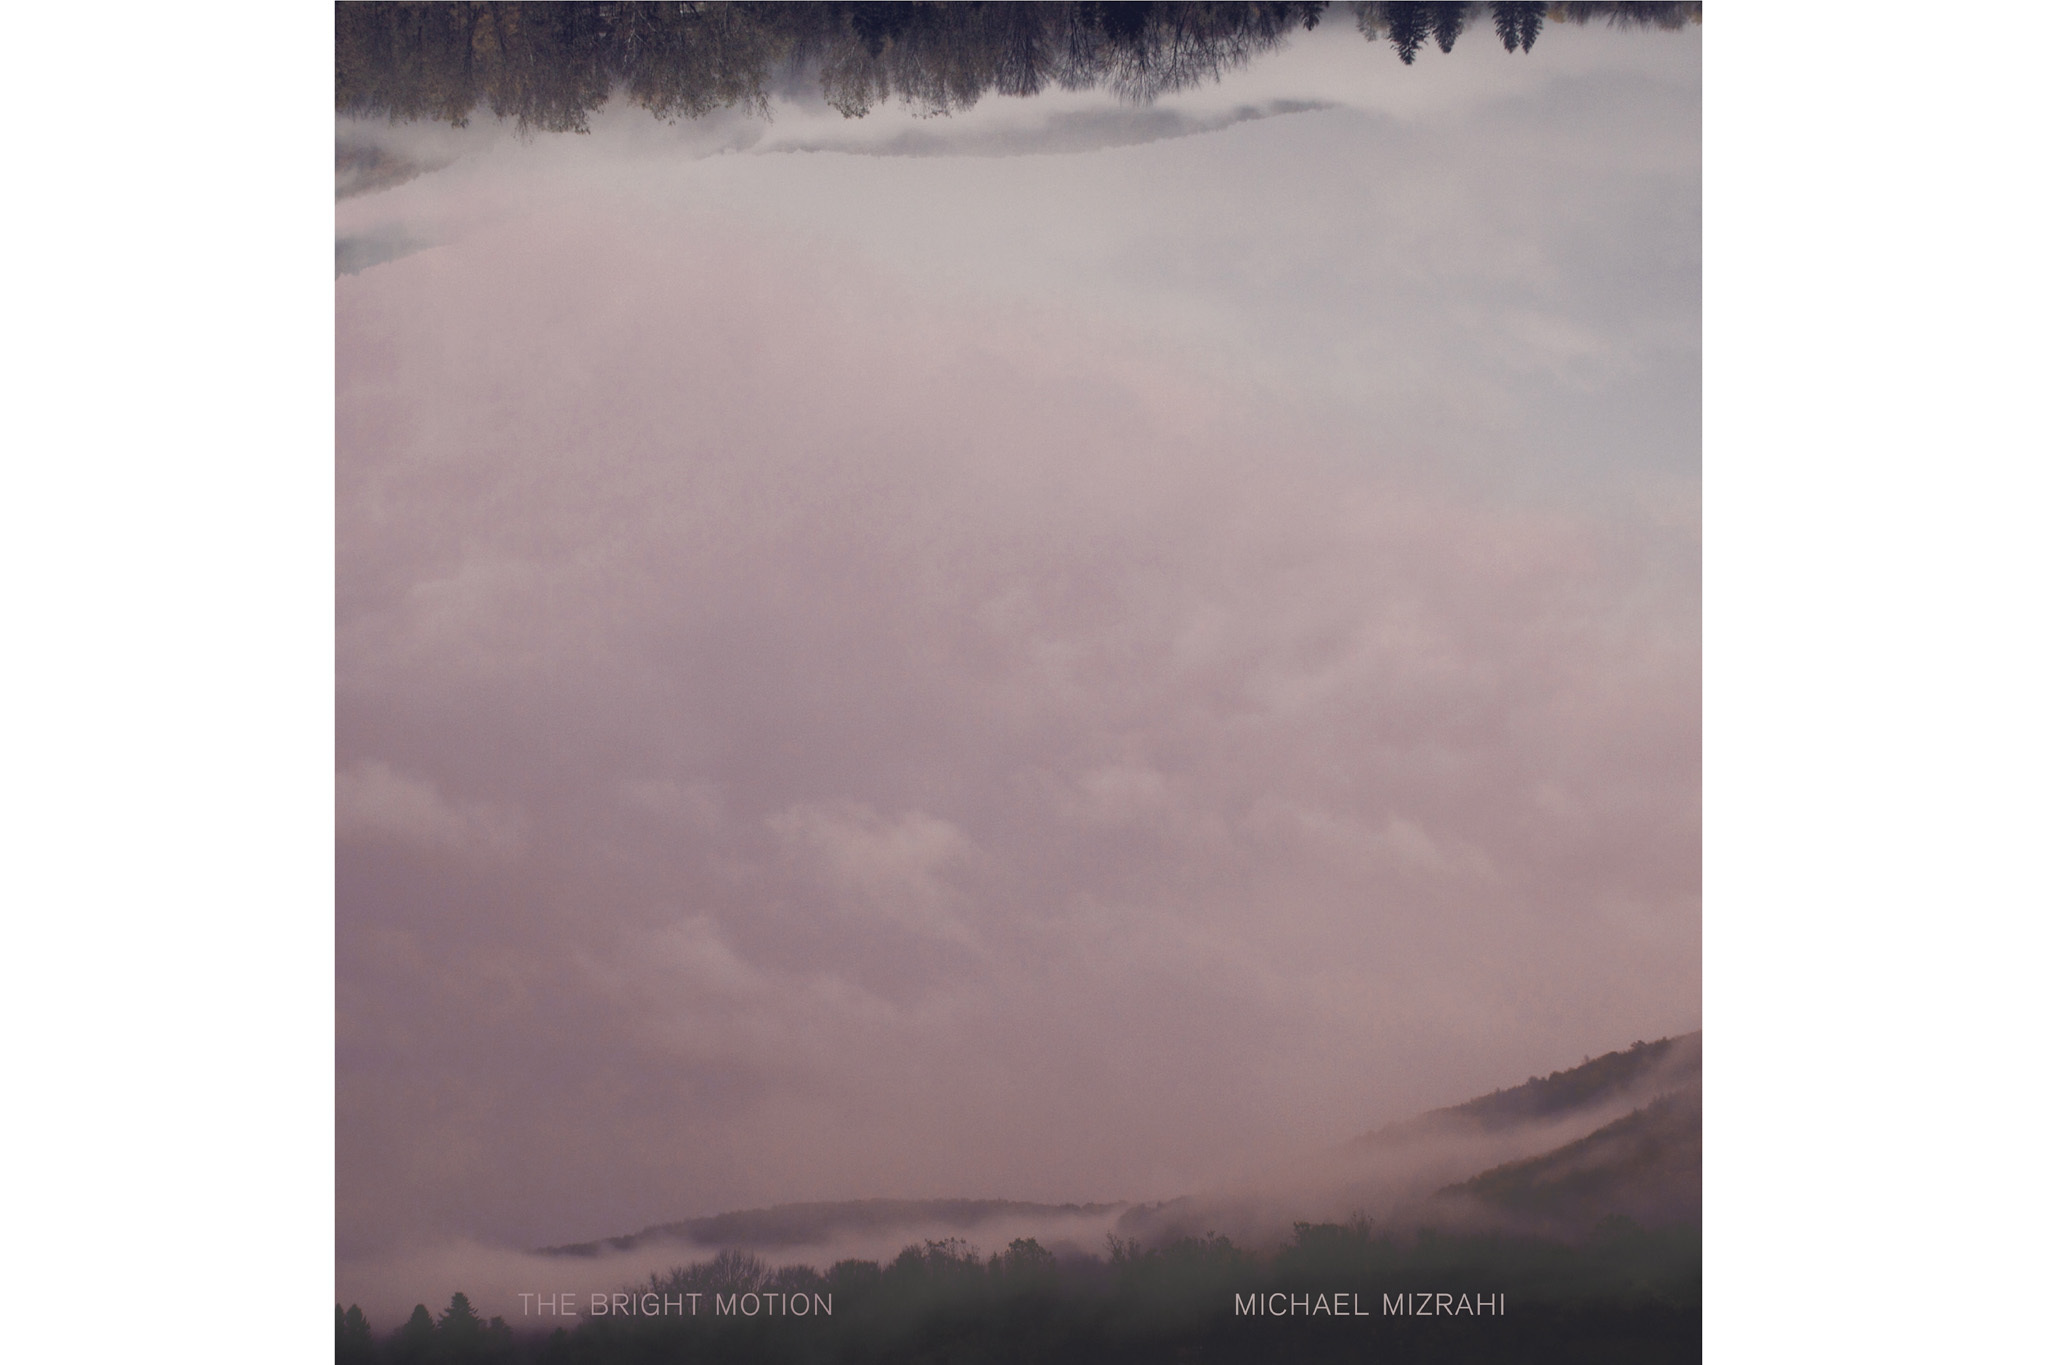 Michael Mizrahi, The Bright Motion (New Amsterdam)